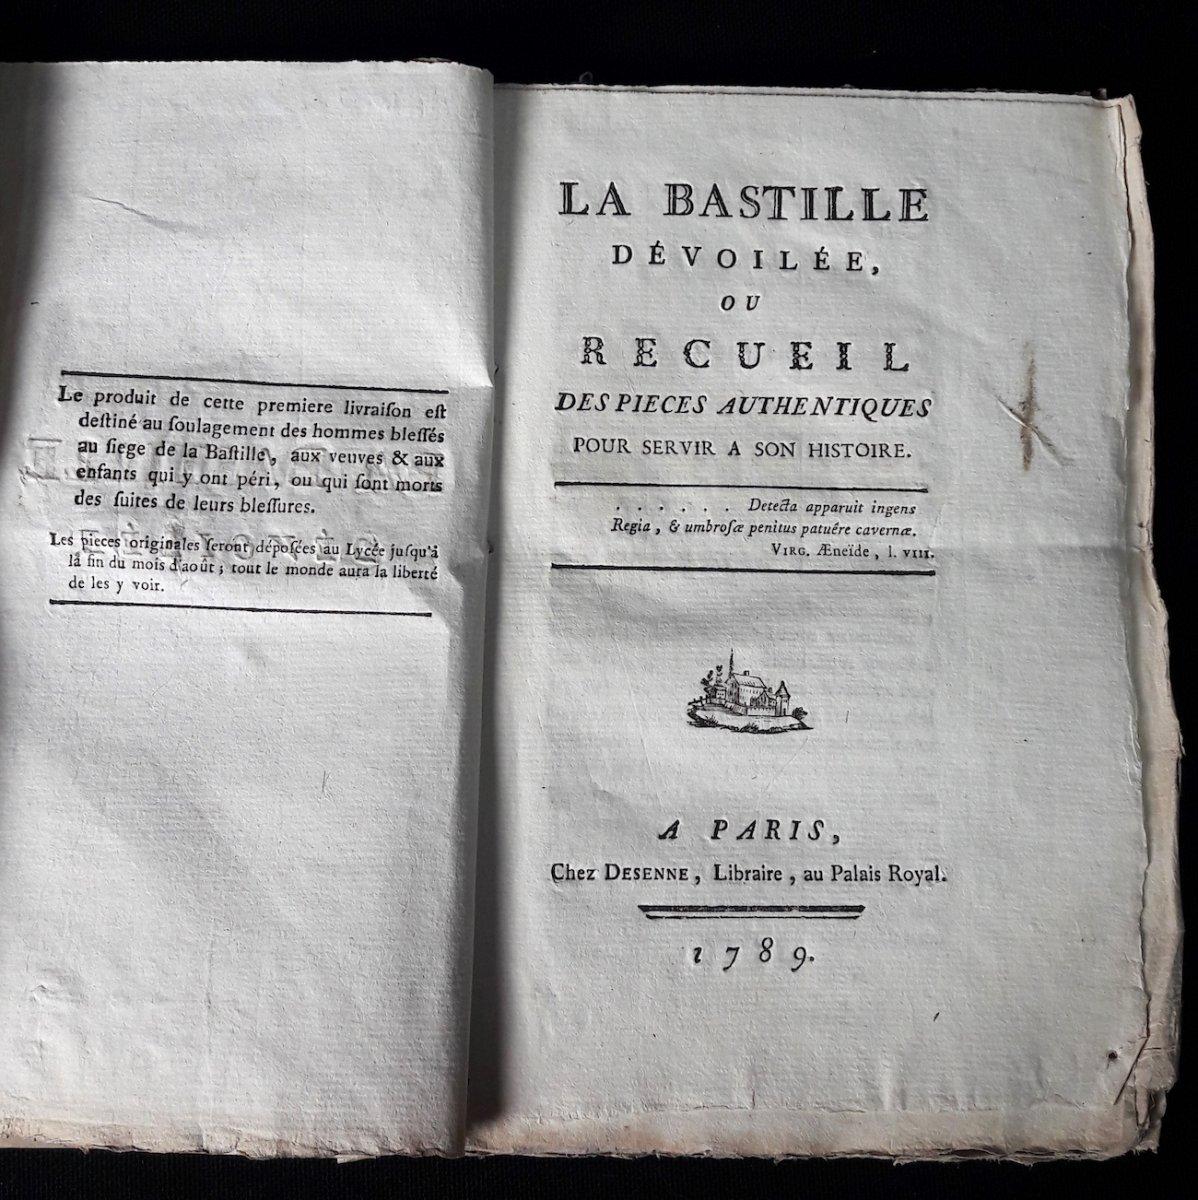 La Bastille Unveiled, By François Charpentier, The 3 First Deliveries / 9, Desenne 1789